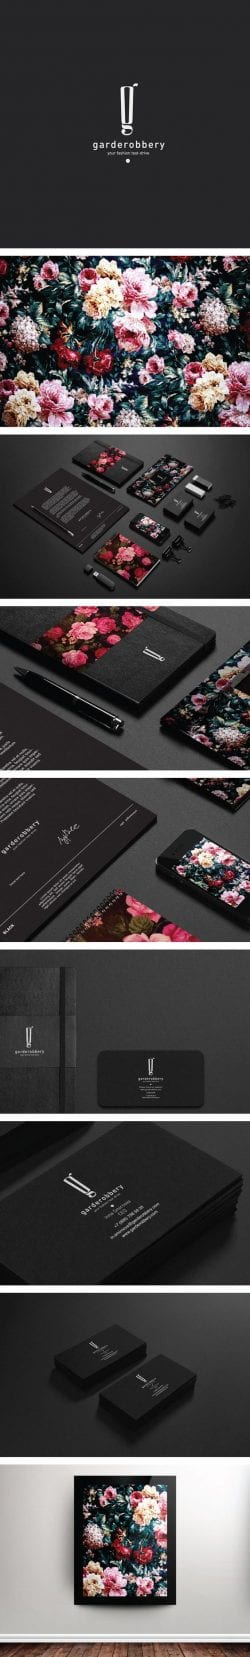 Garderobbery by Pavel Ilyuk | Branding and Identity